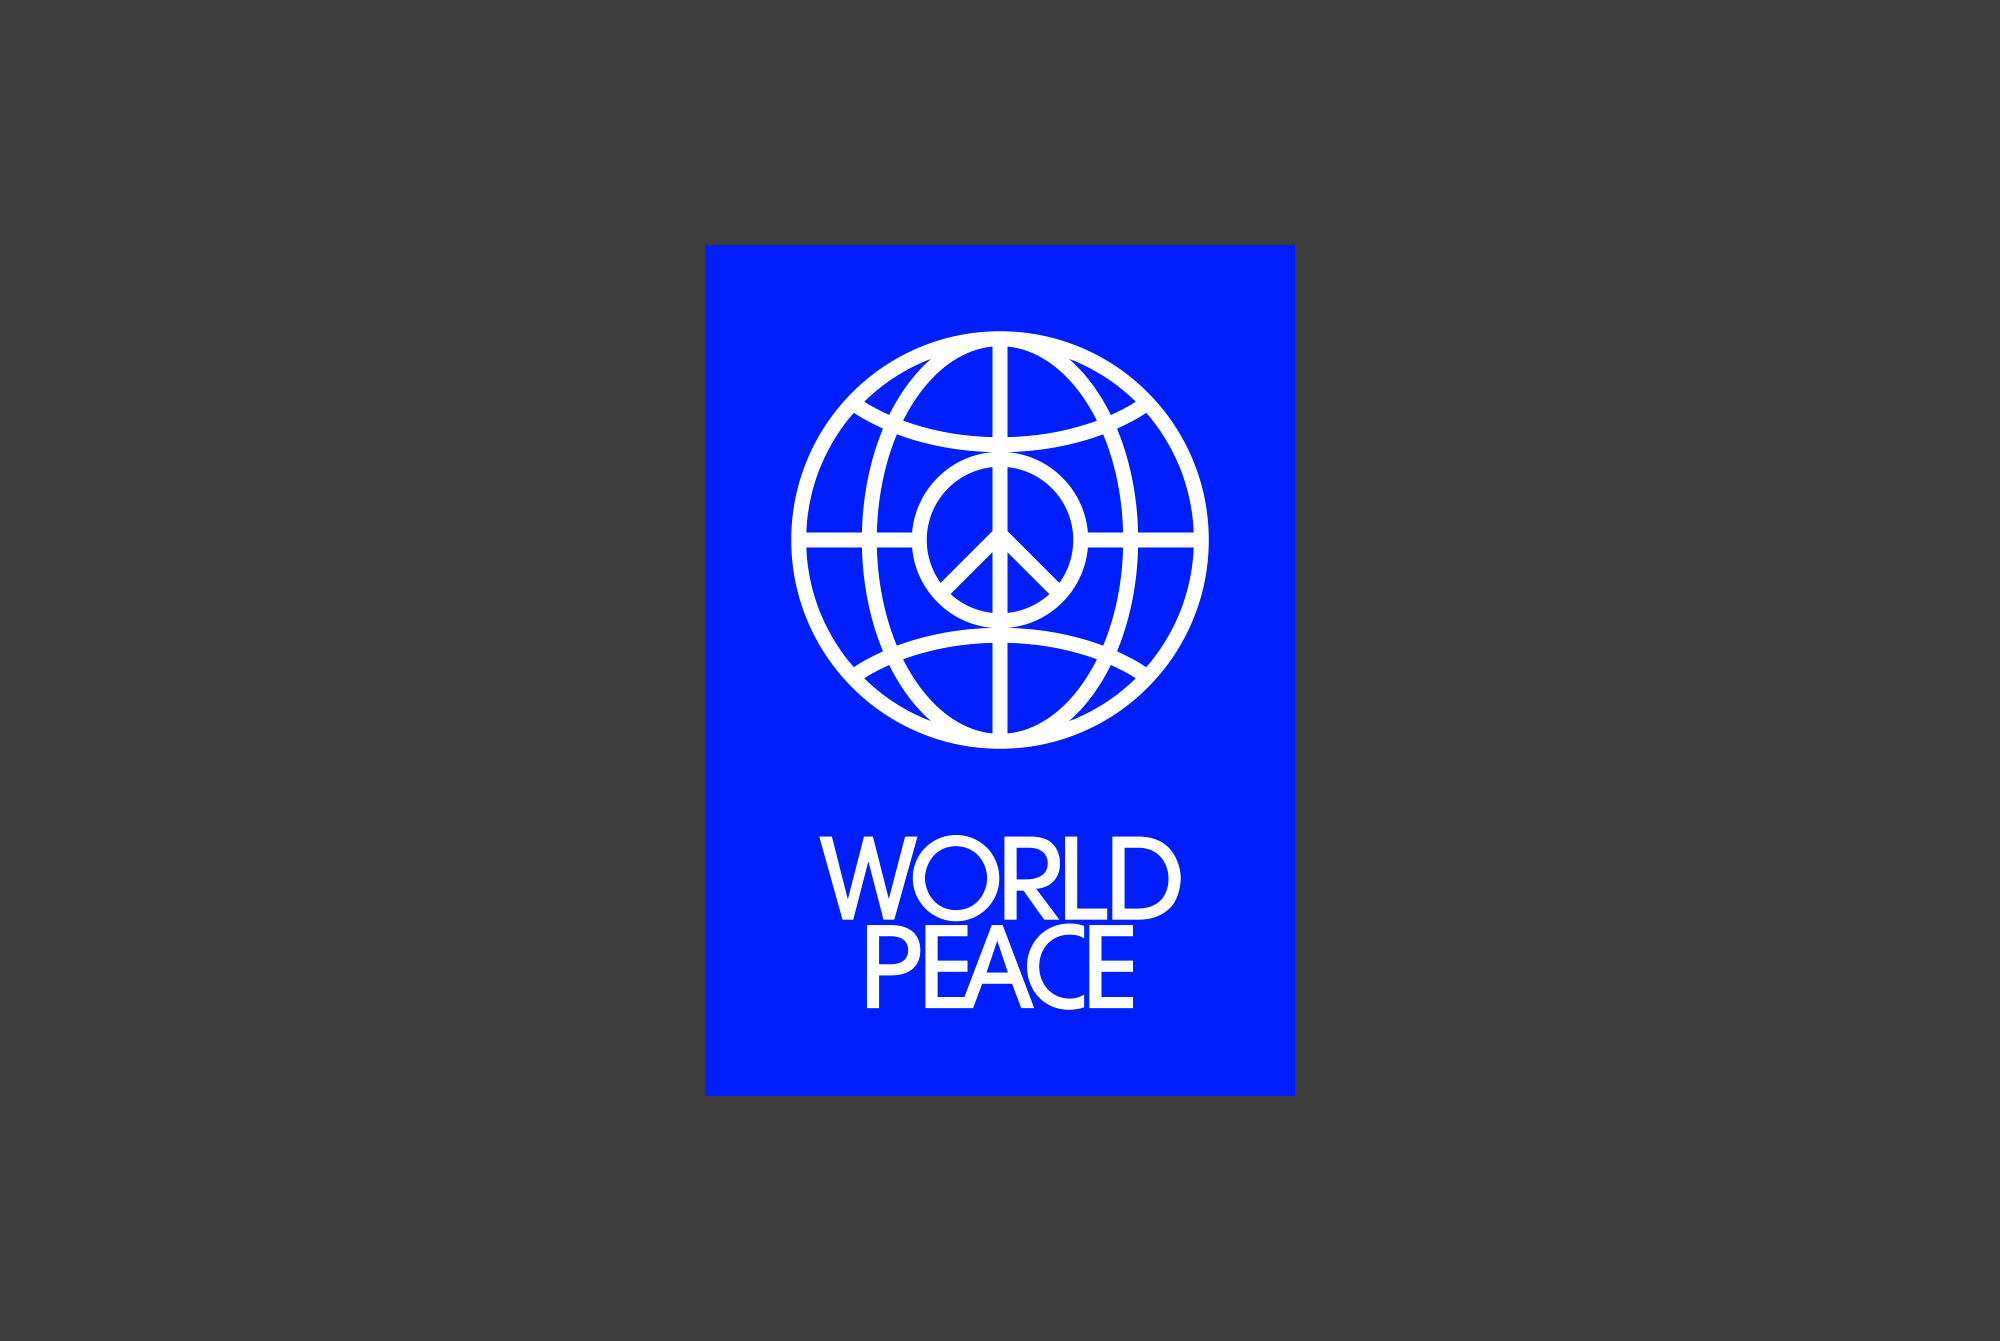 world-peace-poster-gabriel-benderski-2.png